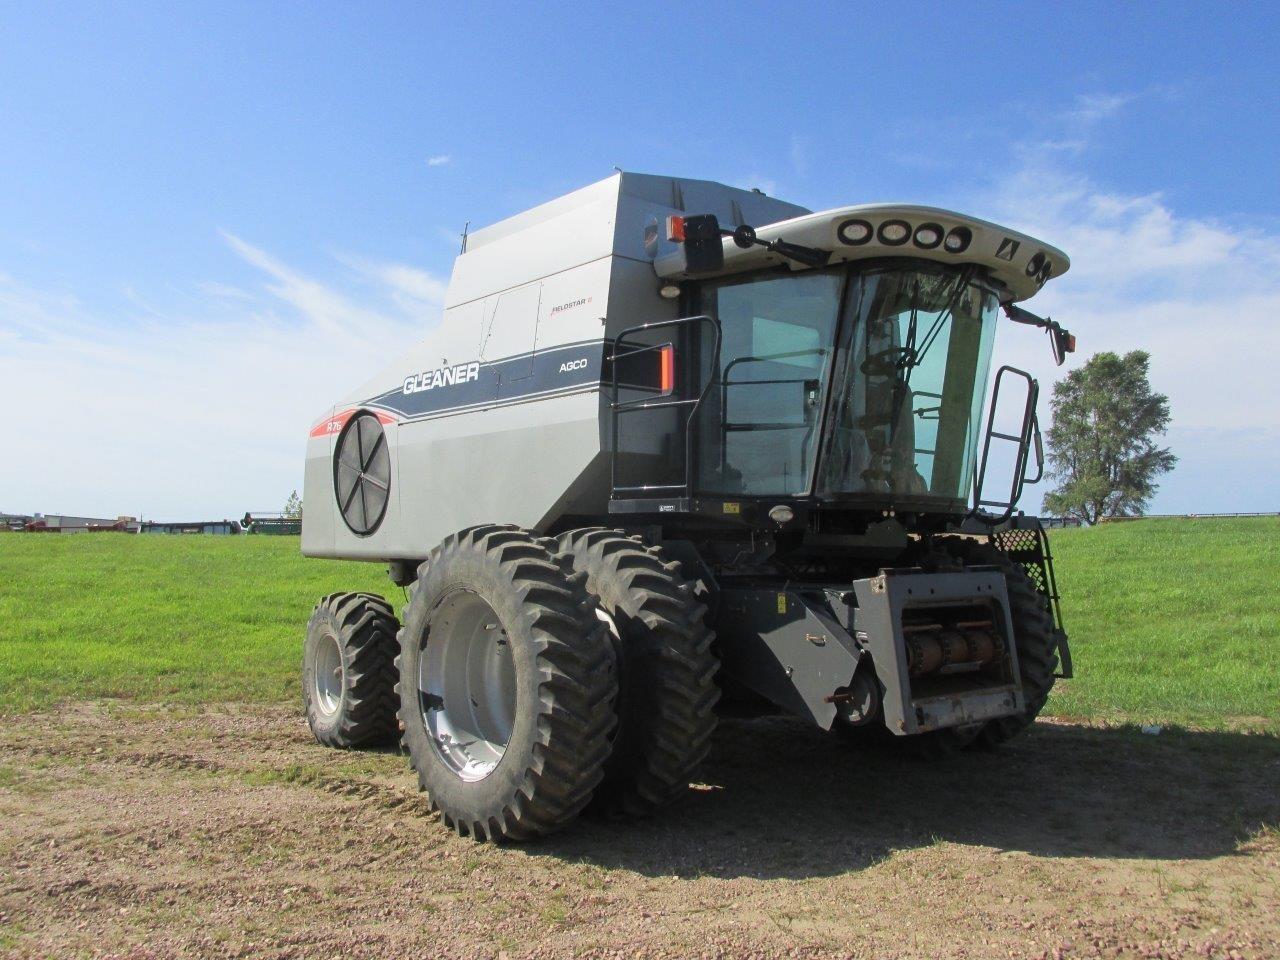 2009 Gleaner R76 Combine